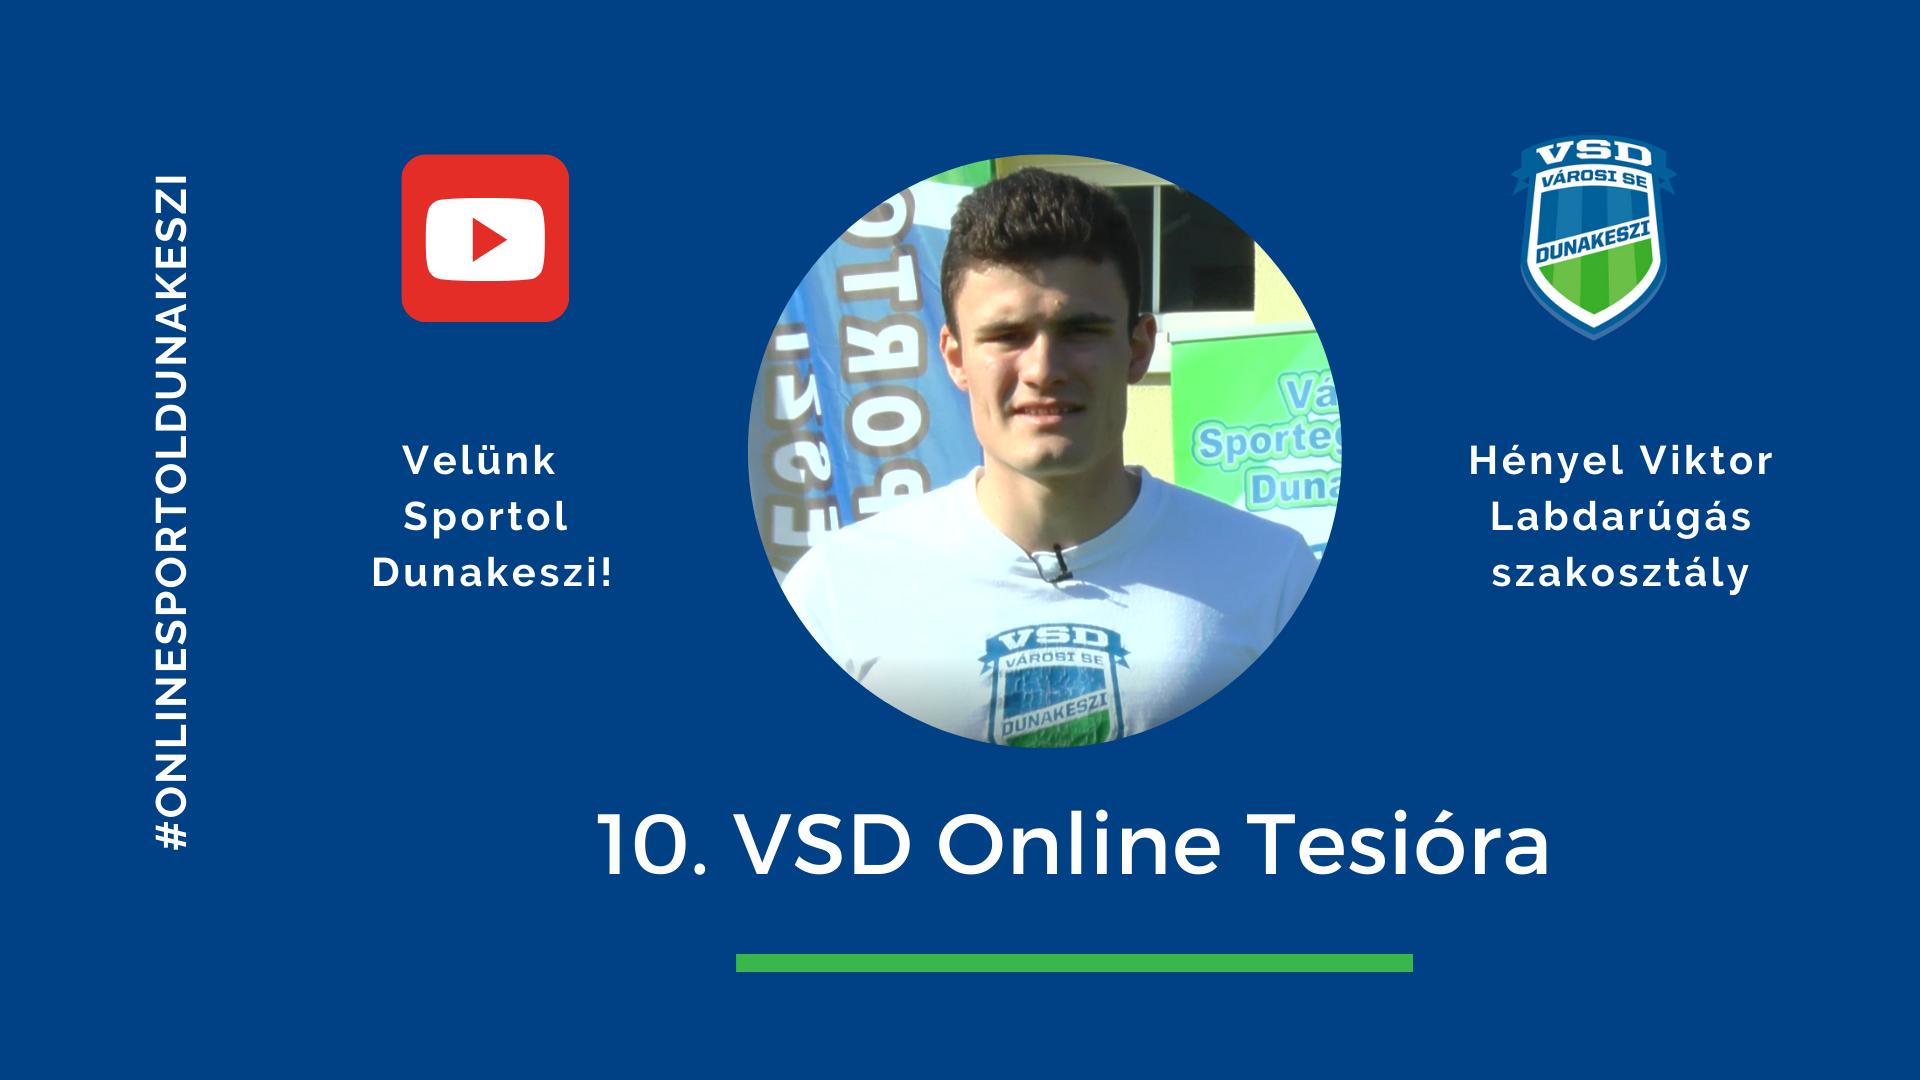 VSD jégkorong online tesi